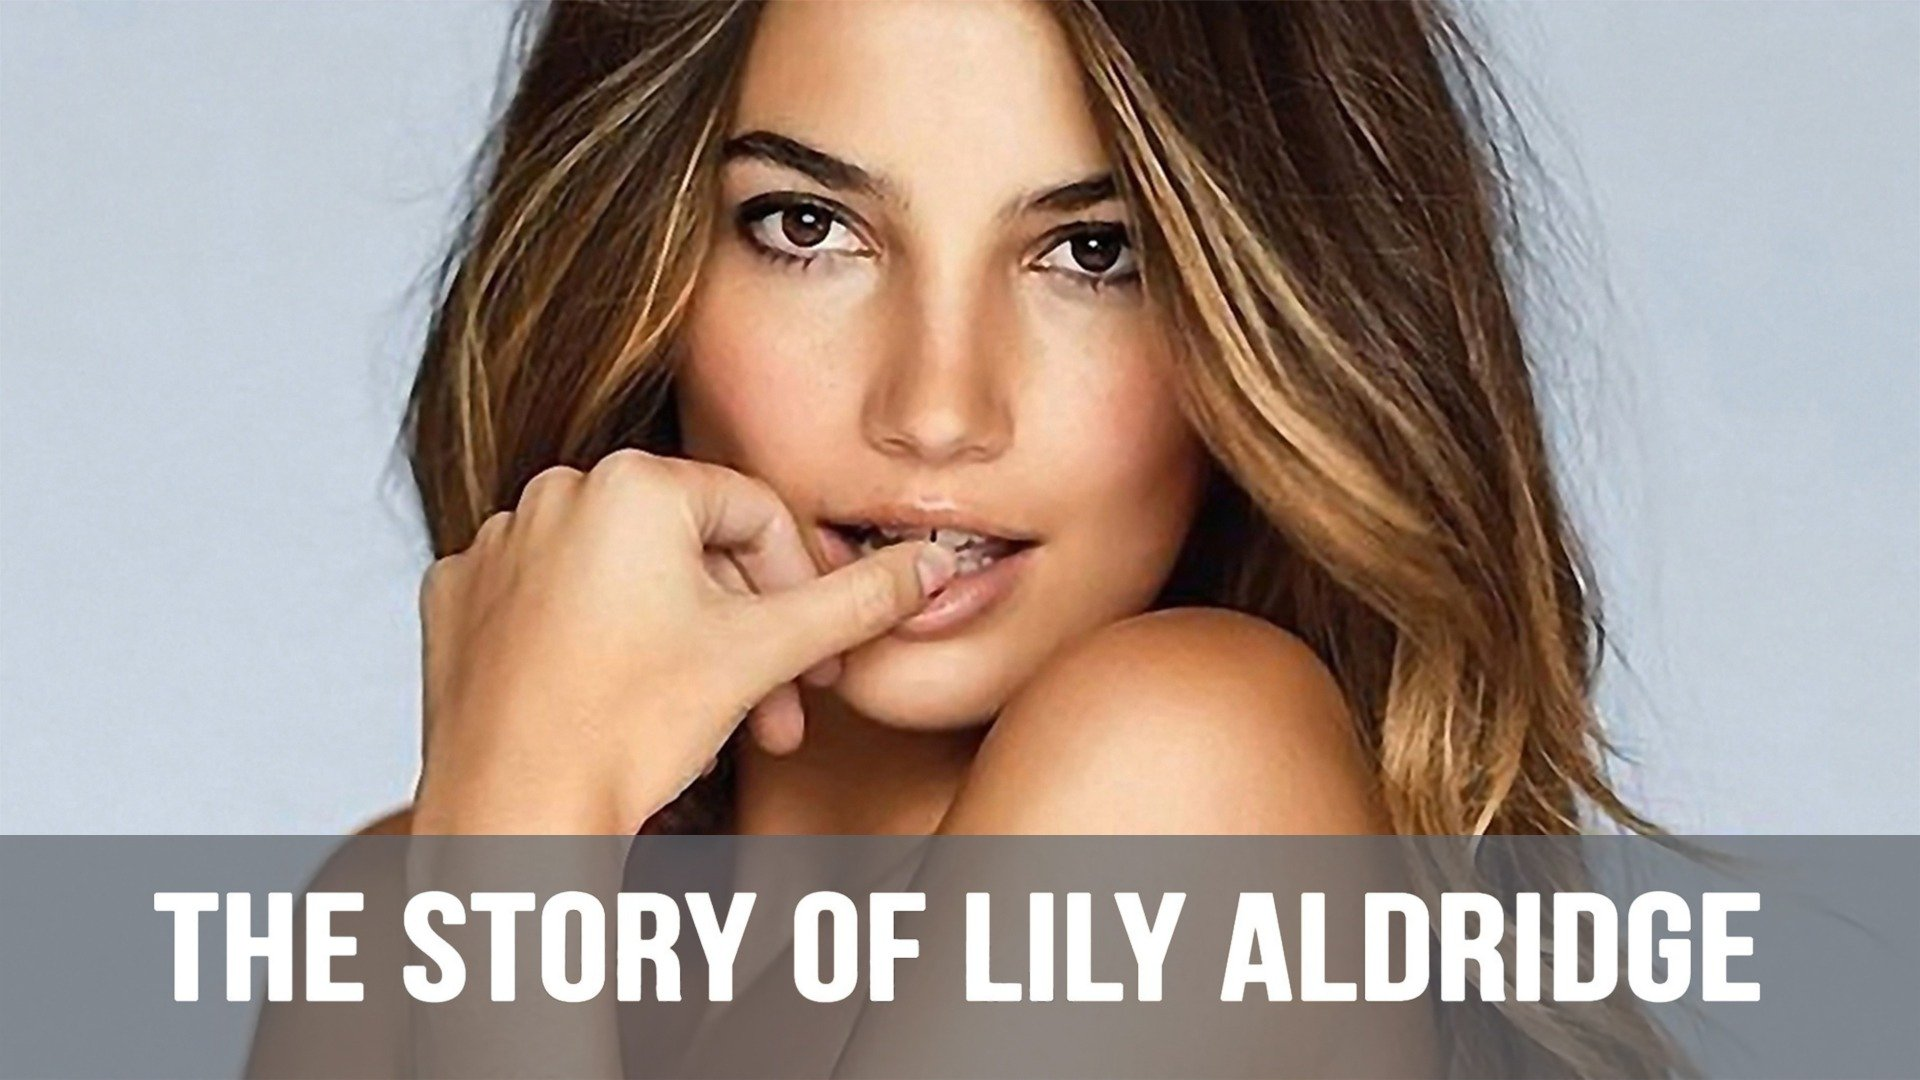 Lily Aldridge Story